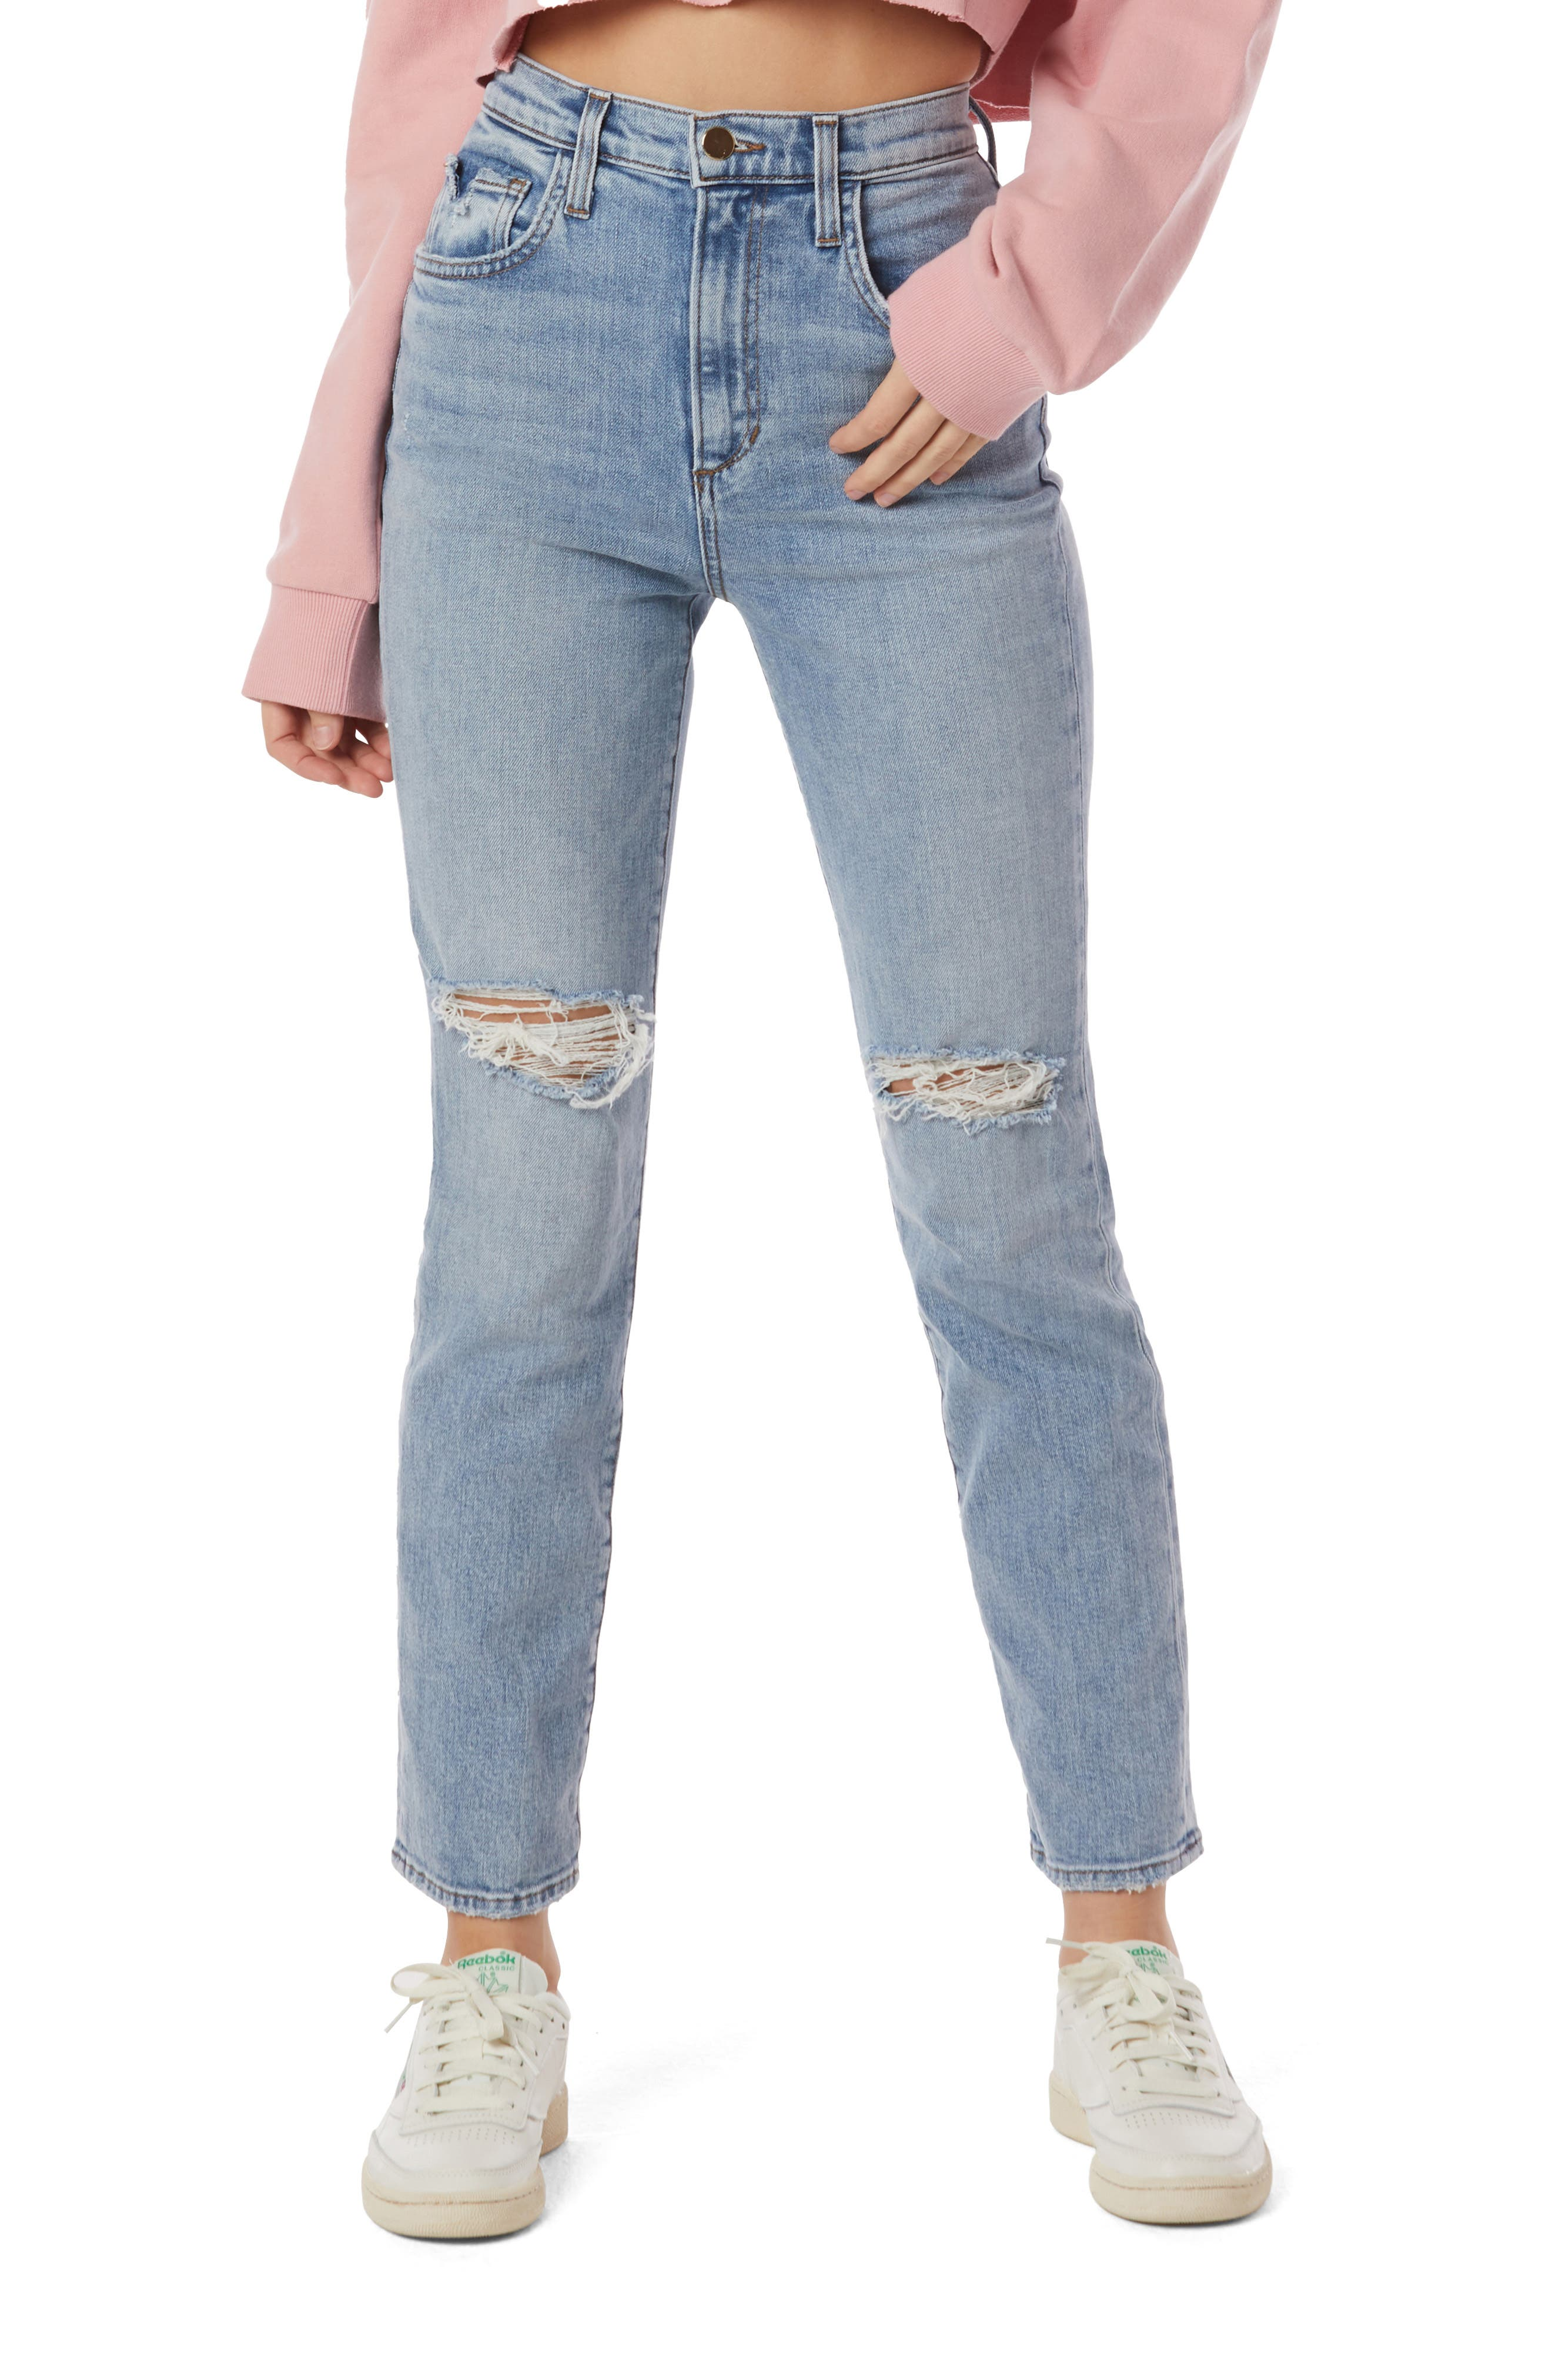 The Valentina Distressed Super High Waist Jeans